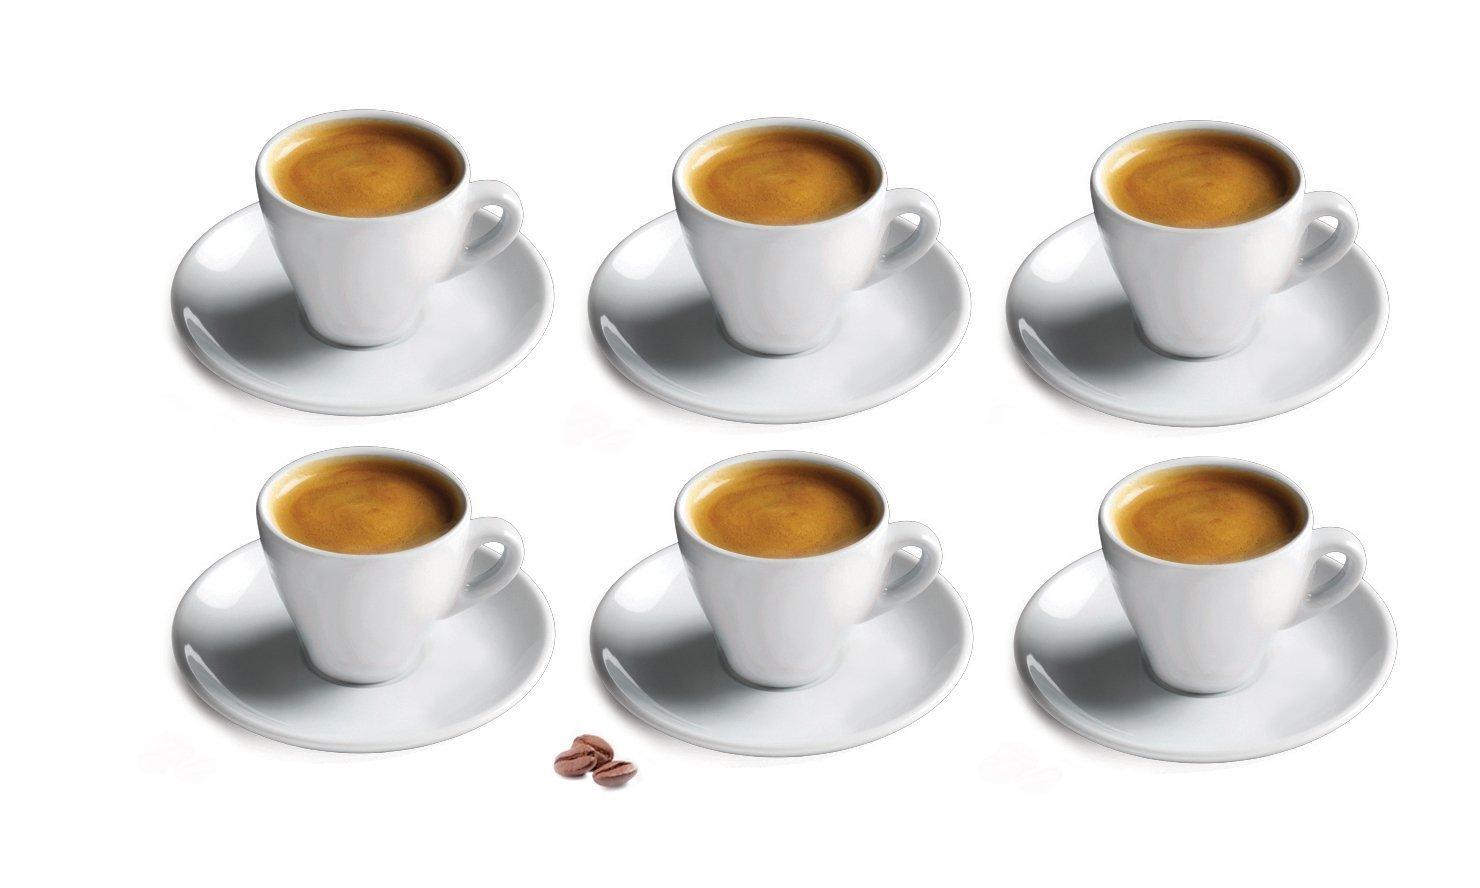 Cuisinox Espresso Cup, Set of 6 Cuisinox (Import) CUP-66